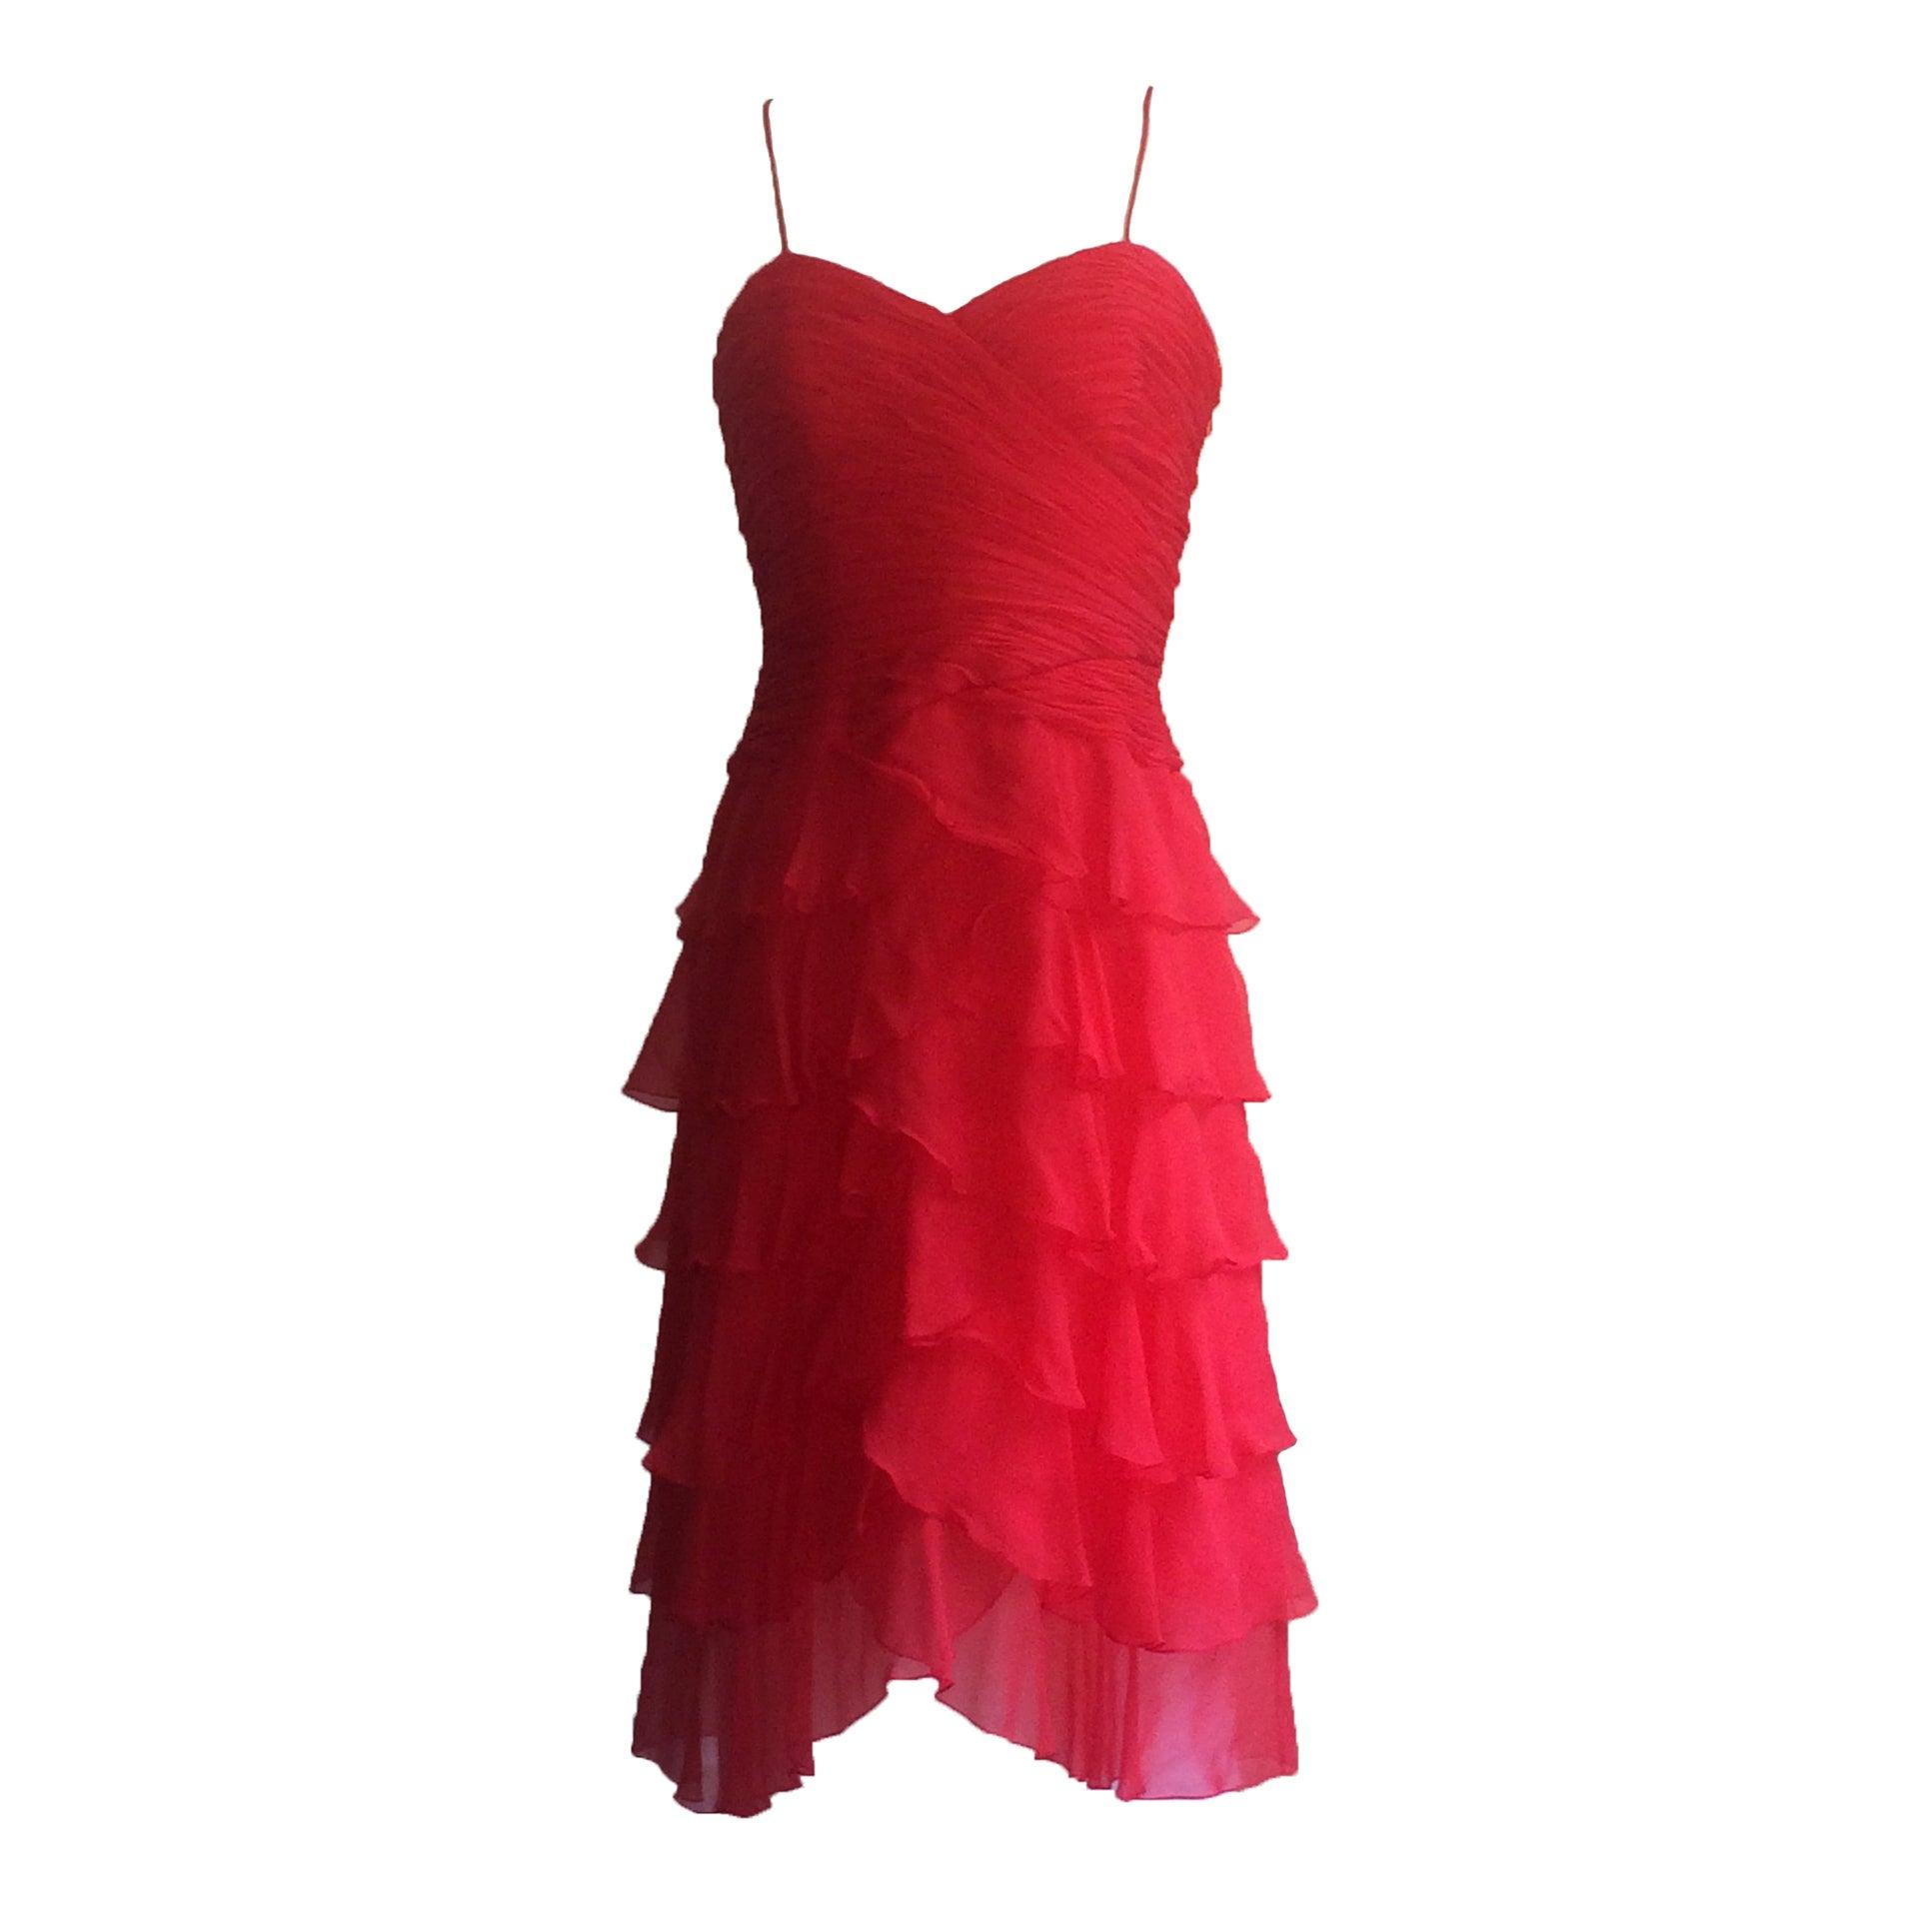 e4fc979e3b Oscar de la Renta Red Silk Chiffon Tiered Skirt Party Dress